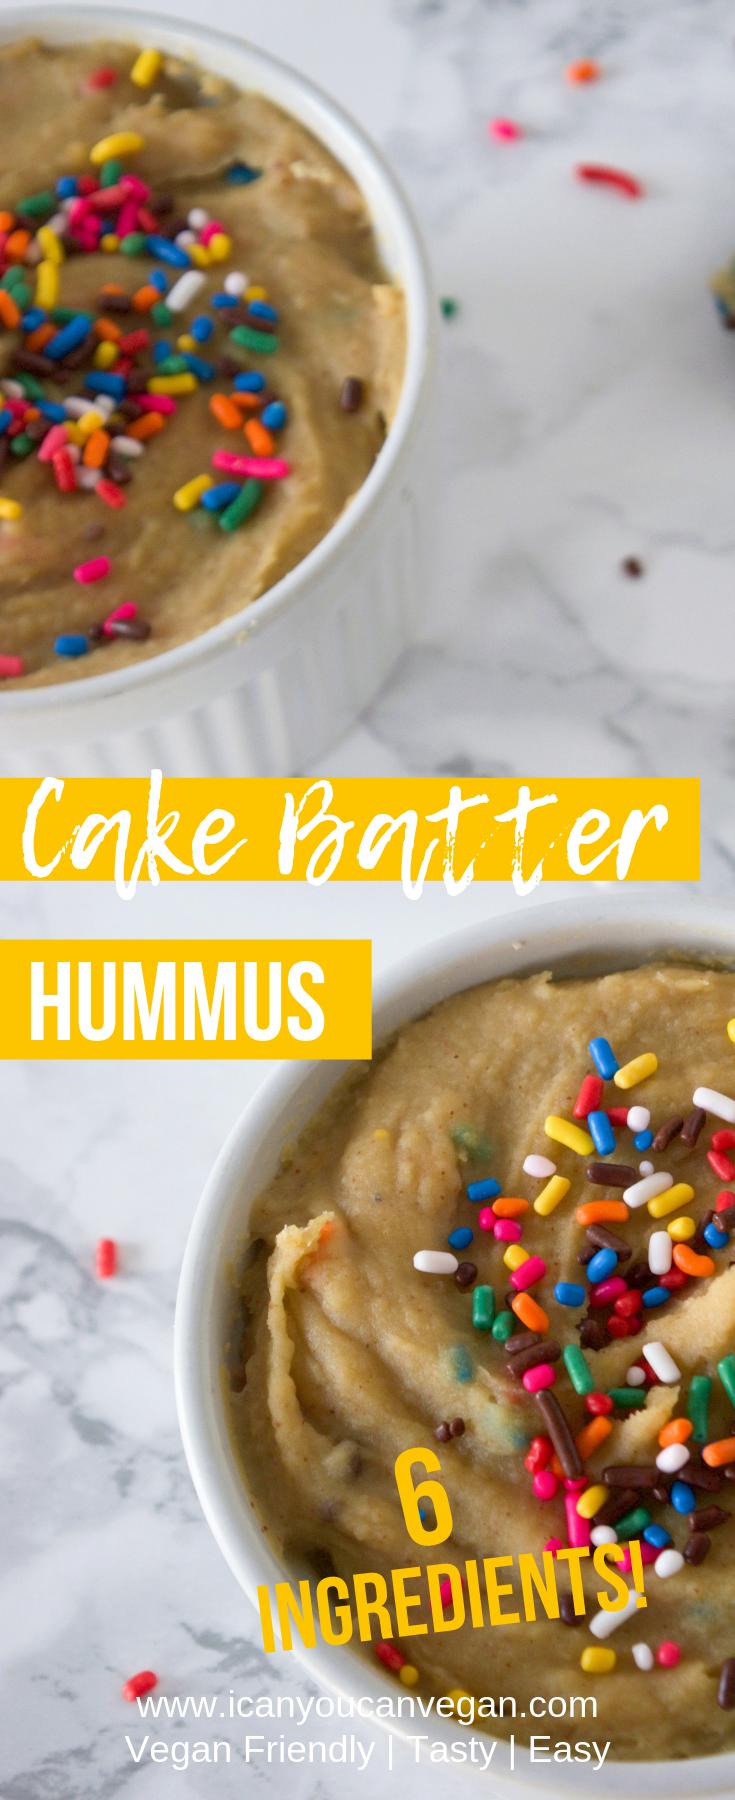 Cake Batter Dessert Hummus | ICanYouCanVegan Cake Batter Hummus